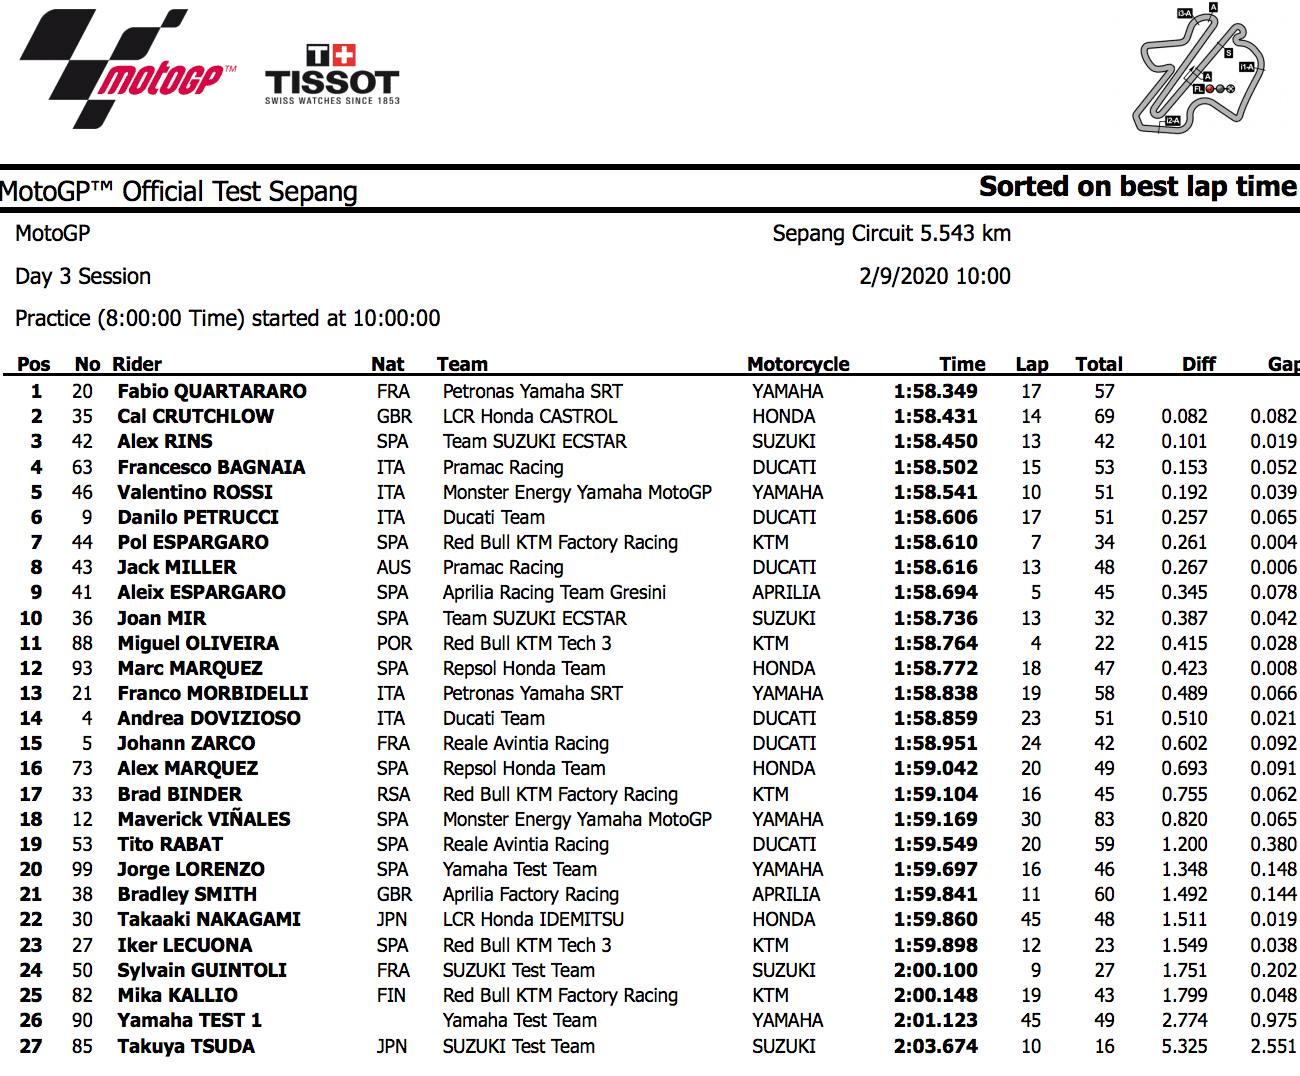 MotoGPセパンテスト3日目 最終日もトップタイムはファビオ・クアルタラロ